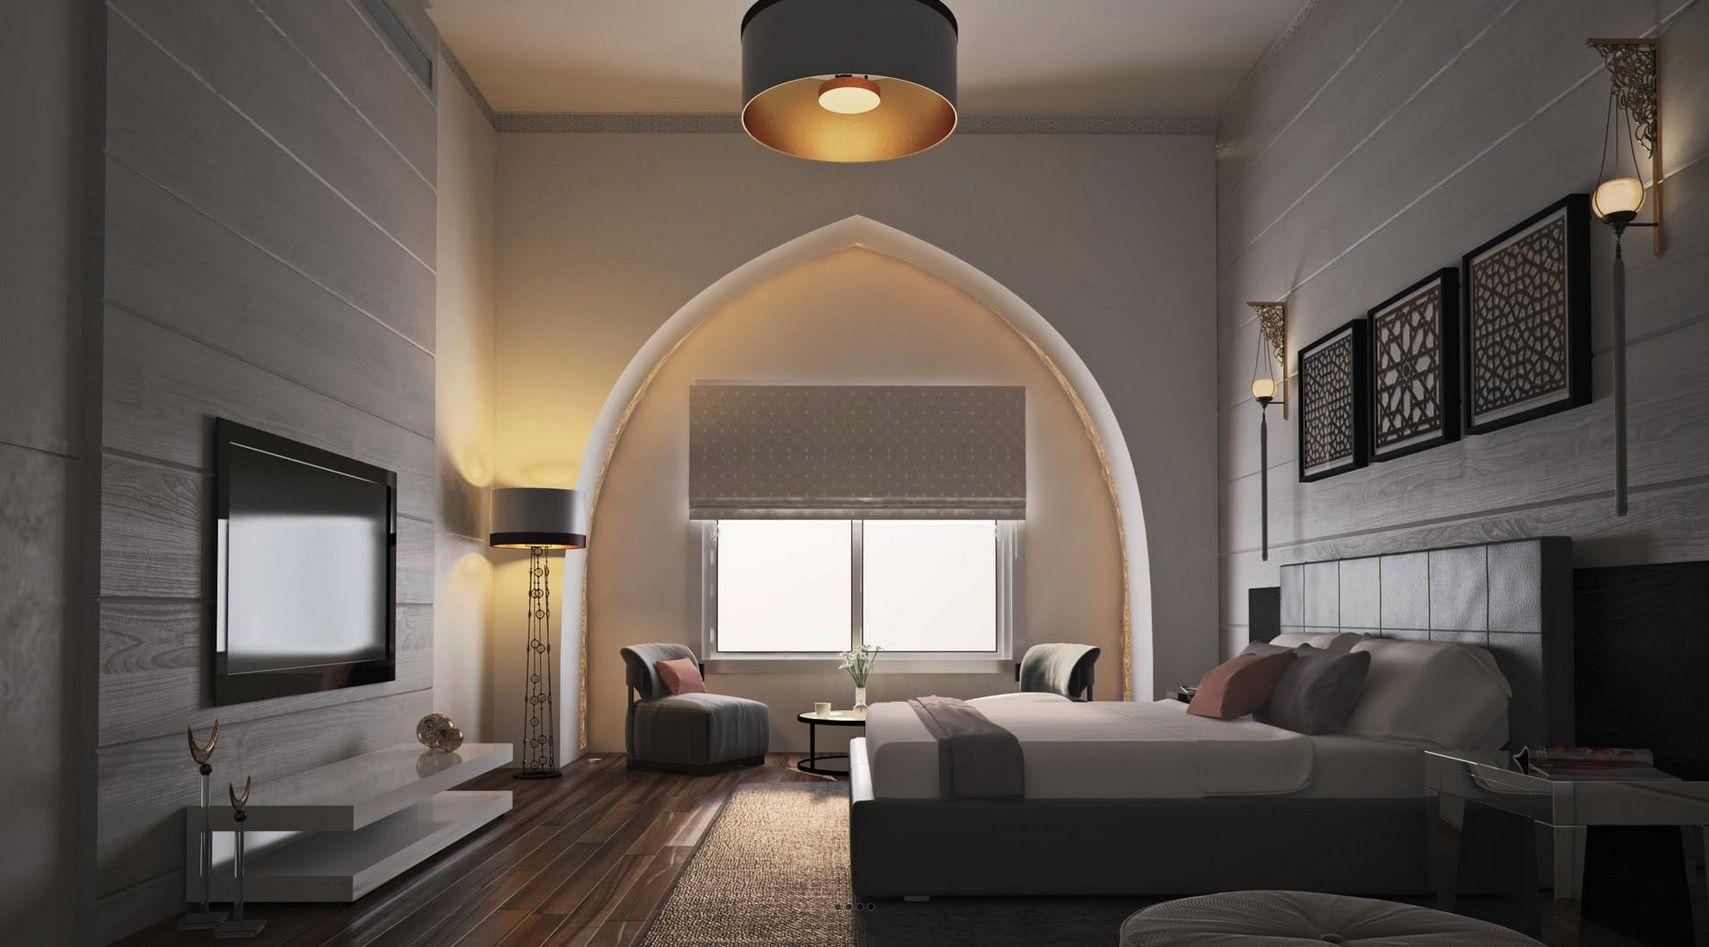 moroccan-style-bedroom   Moroccan style bedroom, Moroccan and Skylight